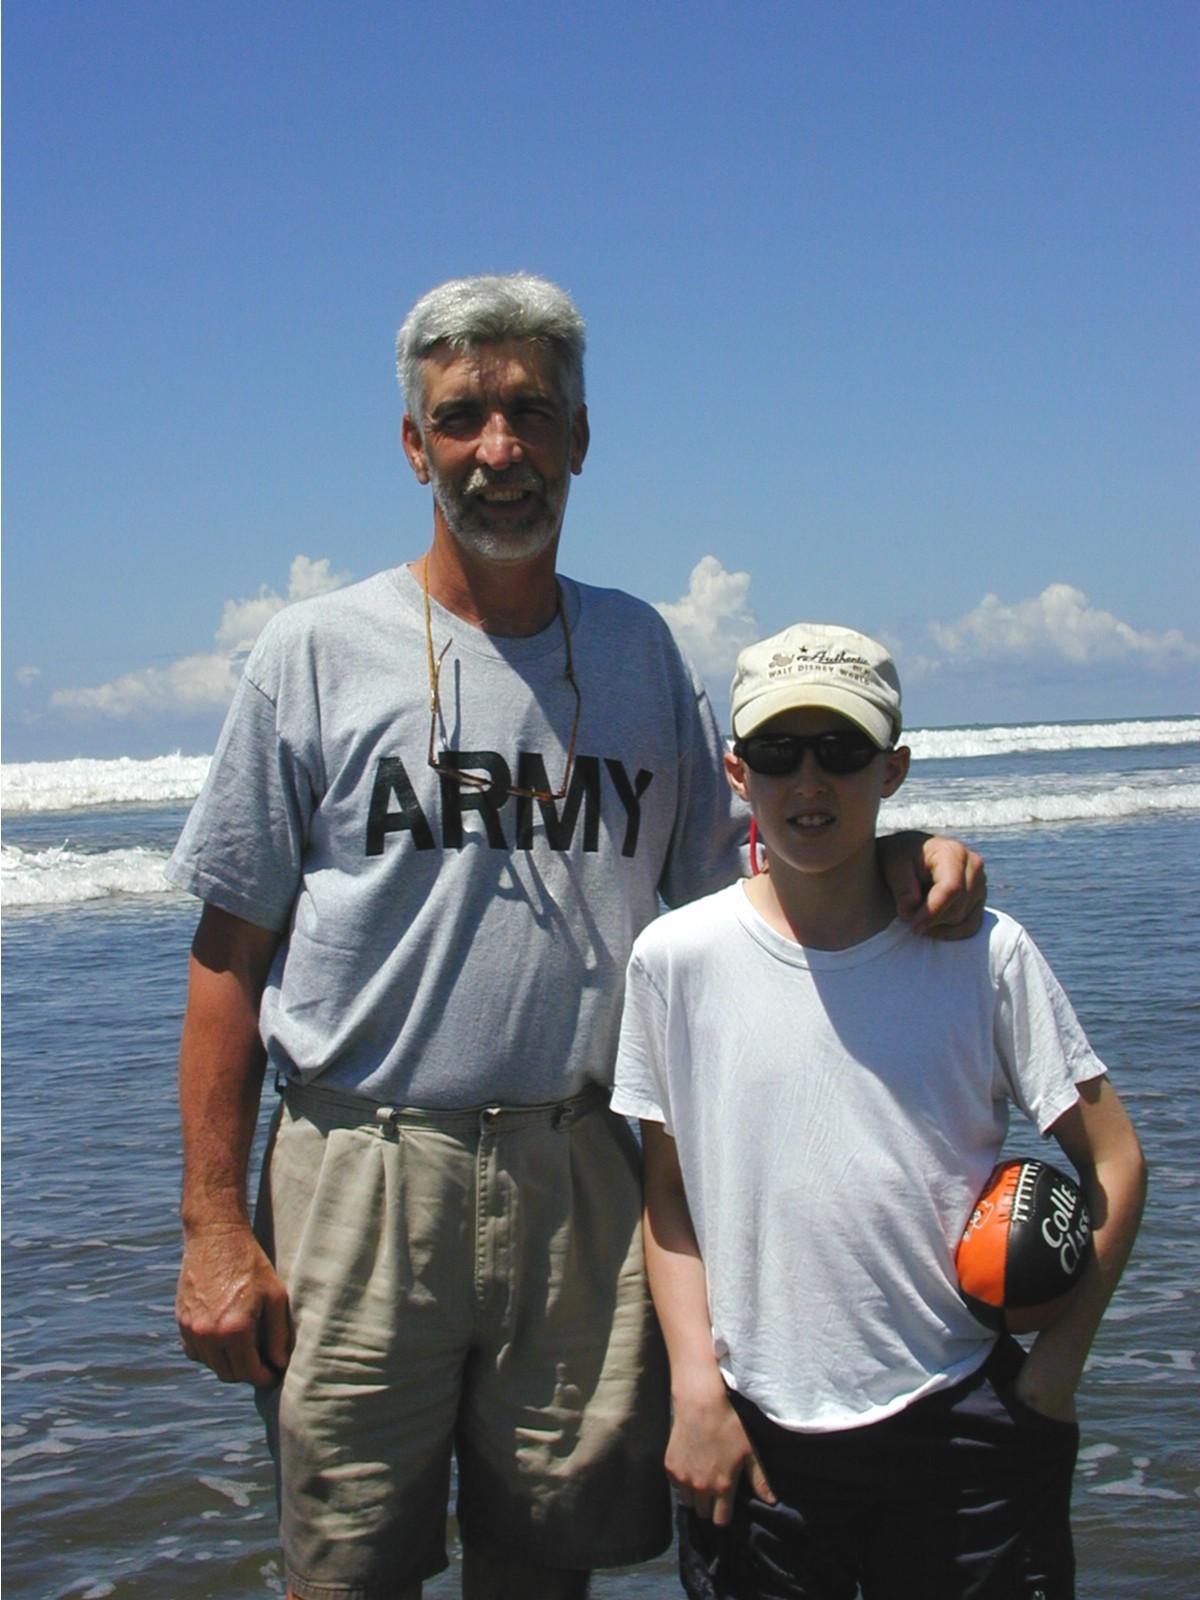 Zach & Larry.JPG